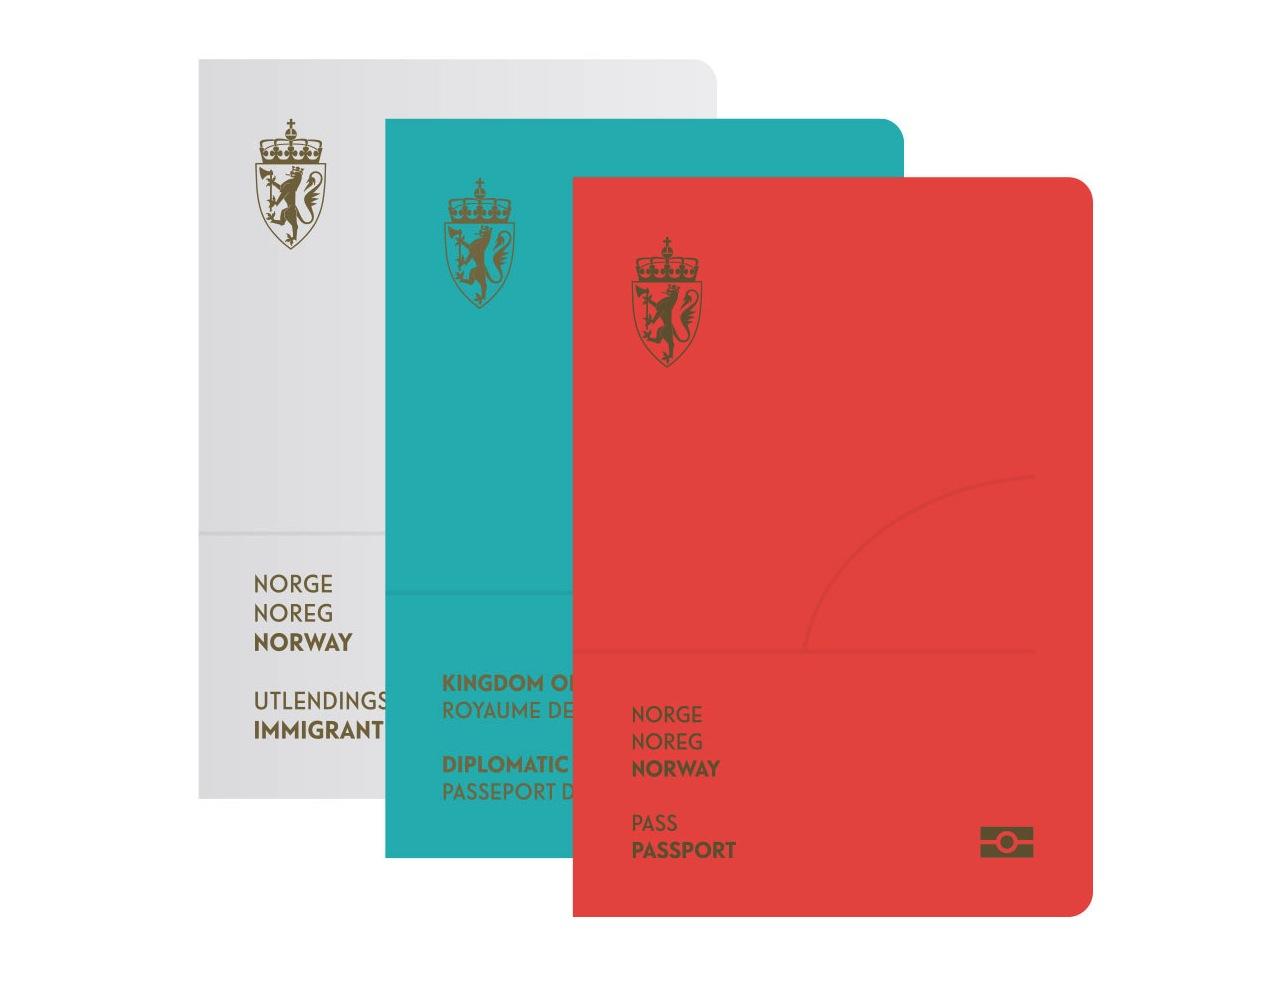 Norway's new passport covers (Image courtesy of Neue)